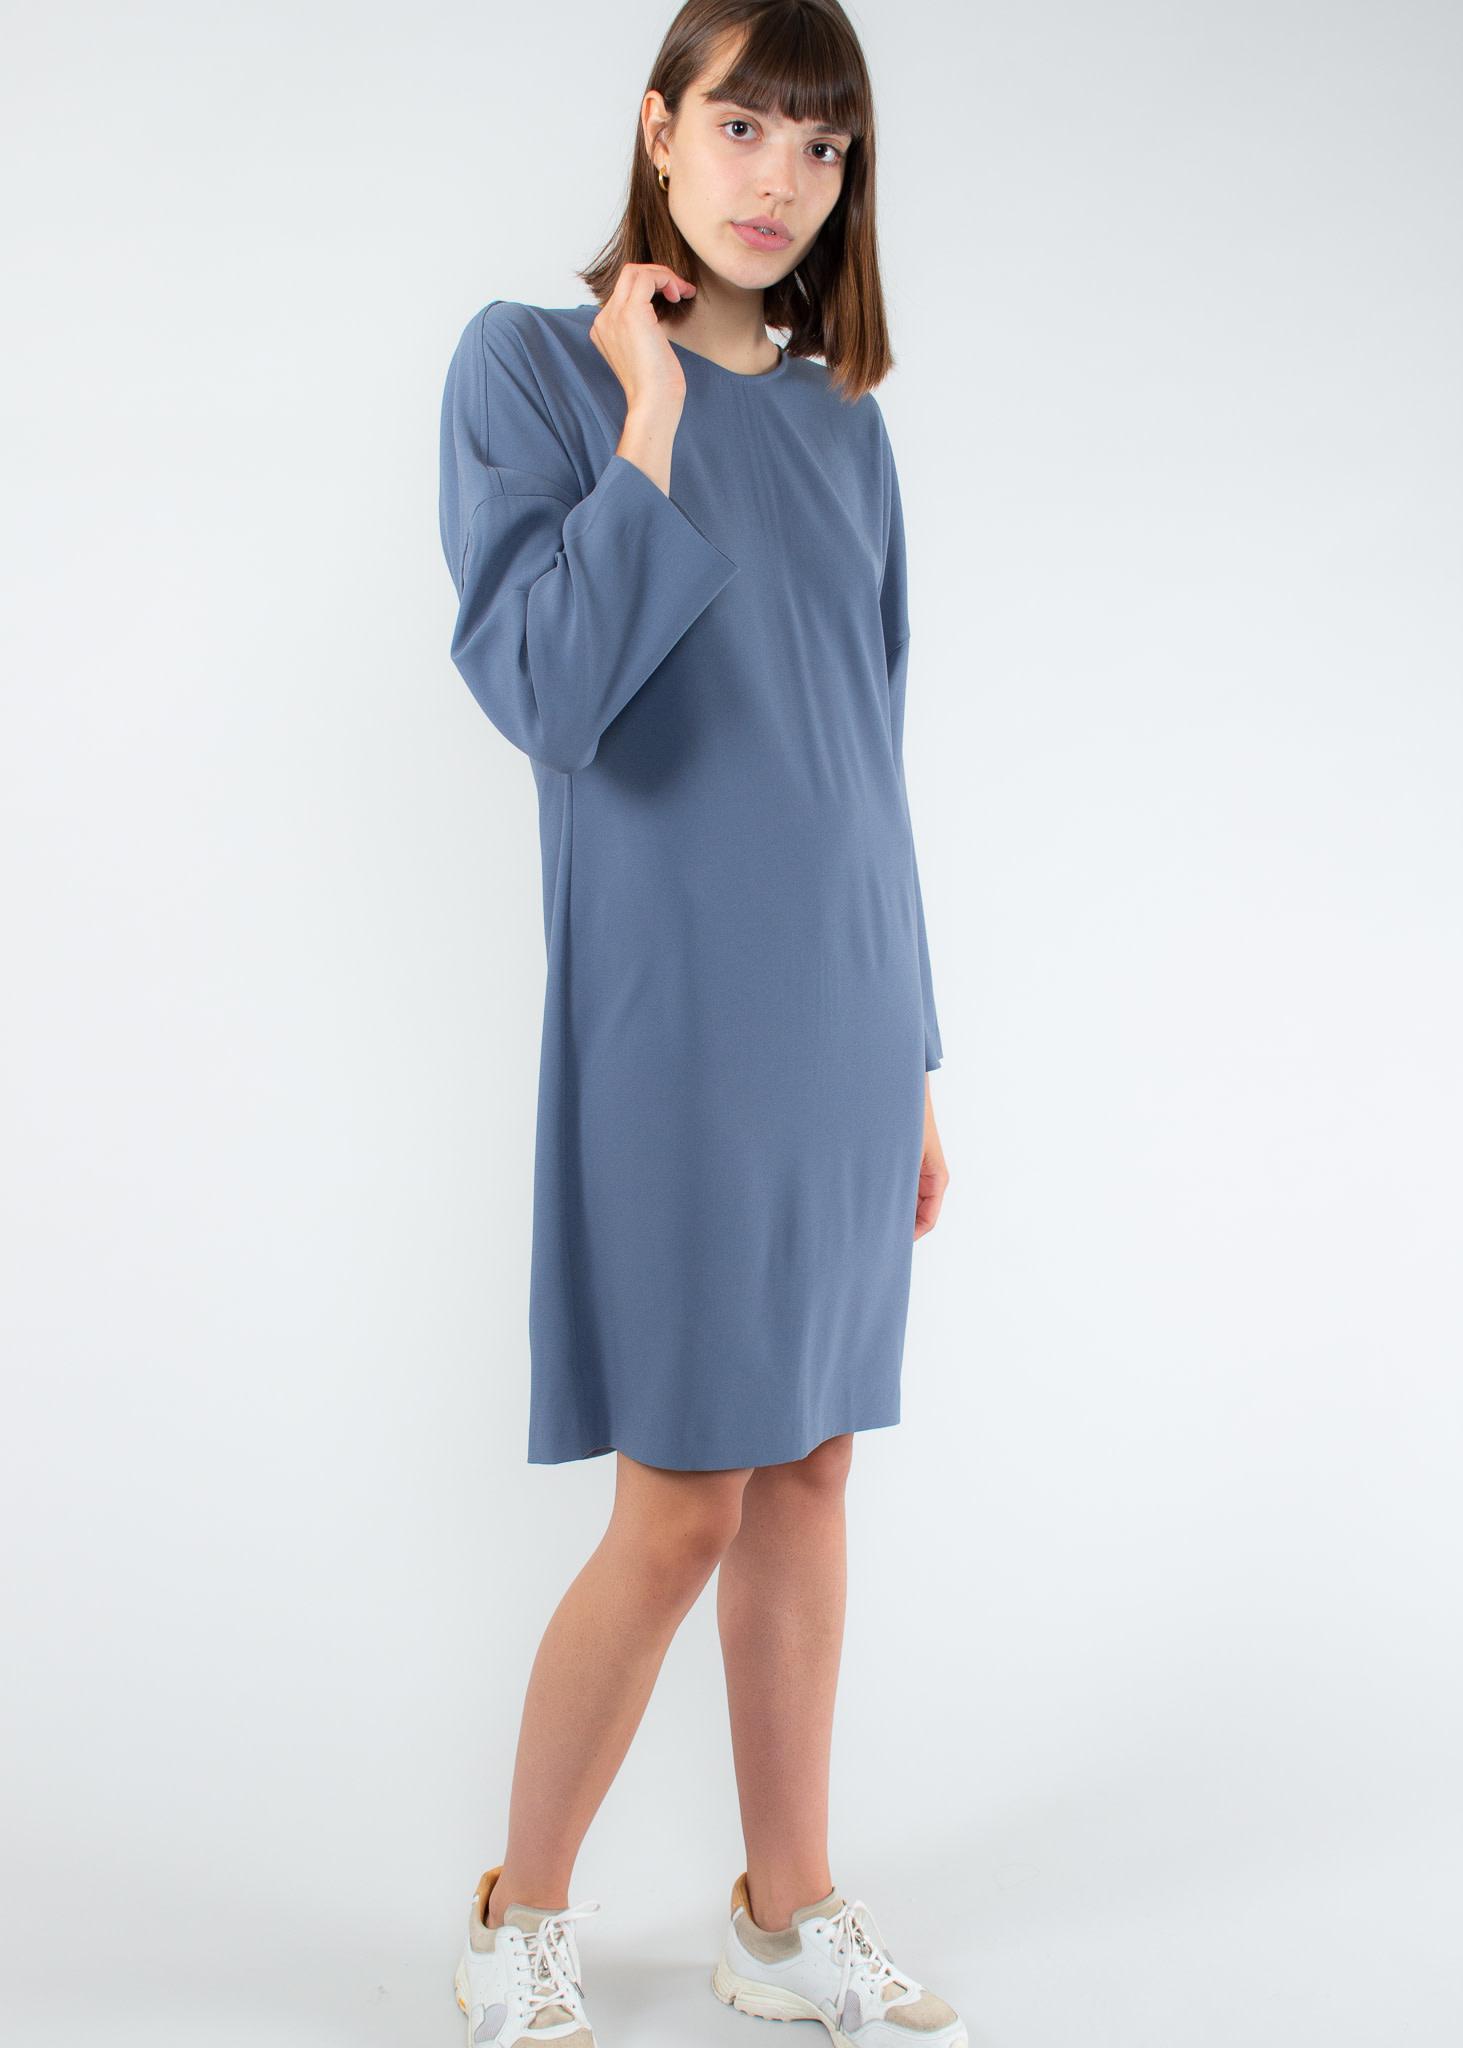 Filippa K Meghan Dress blue grey